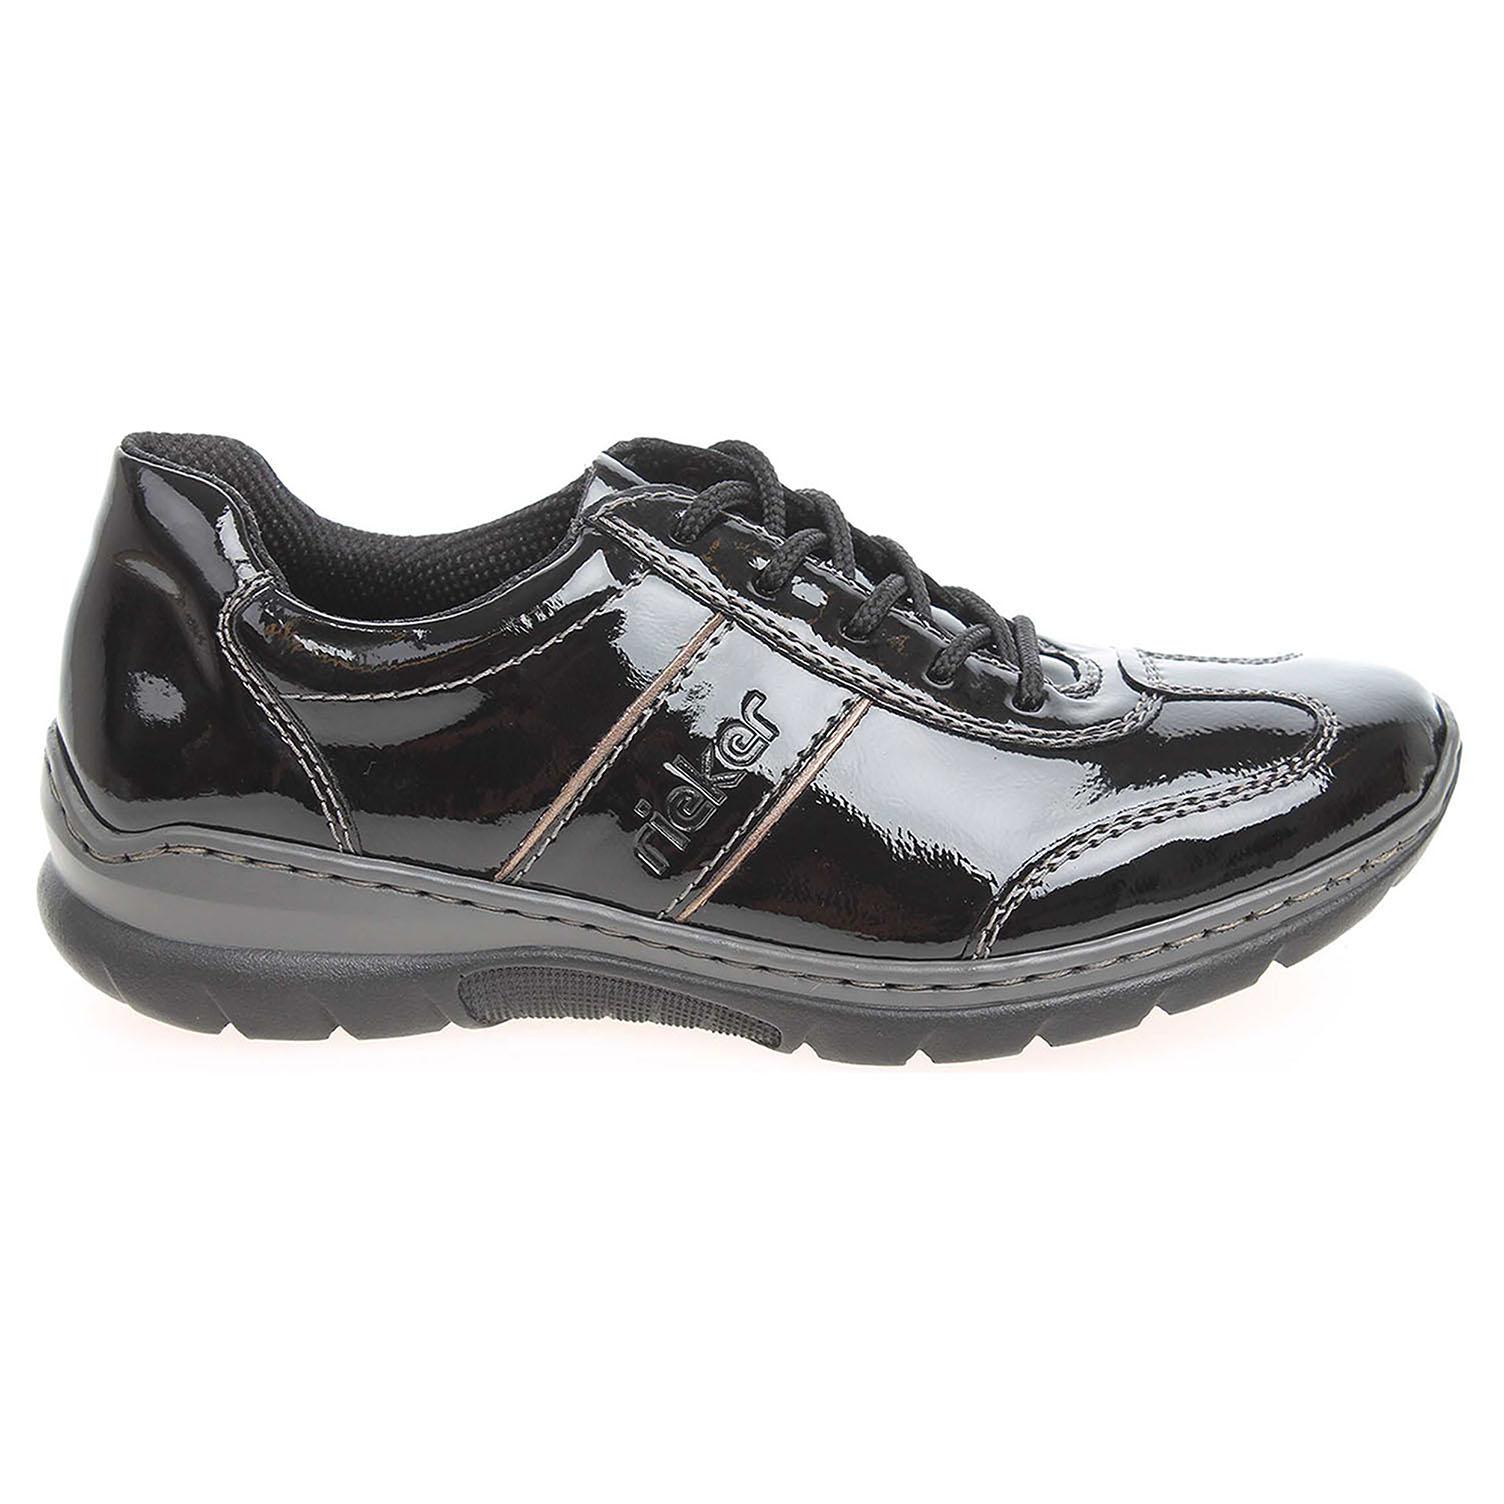 Ecco Rieker dámské polobotky L3224-00 černé 23100514